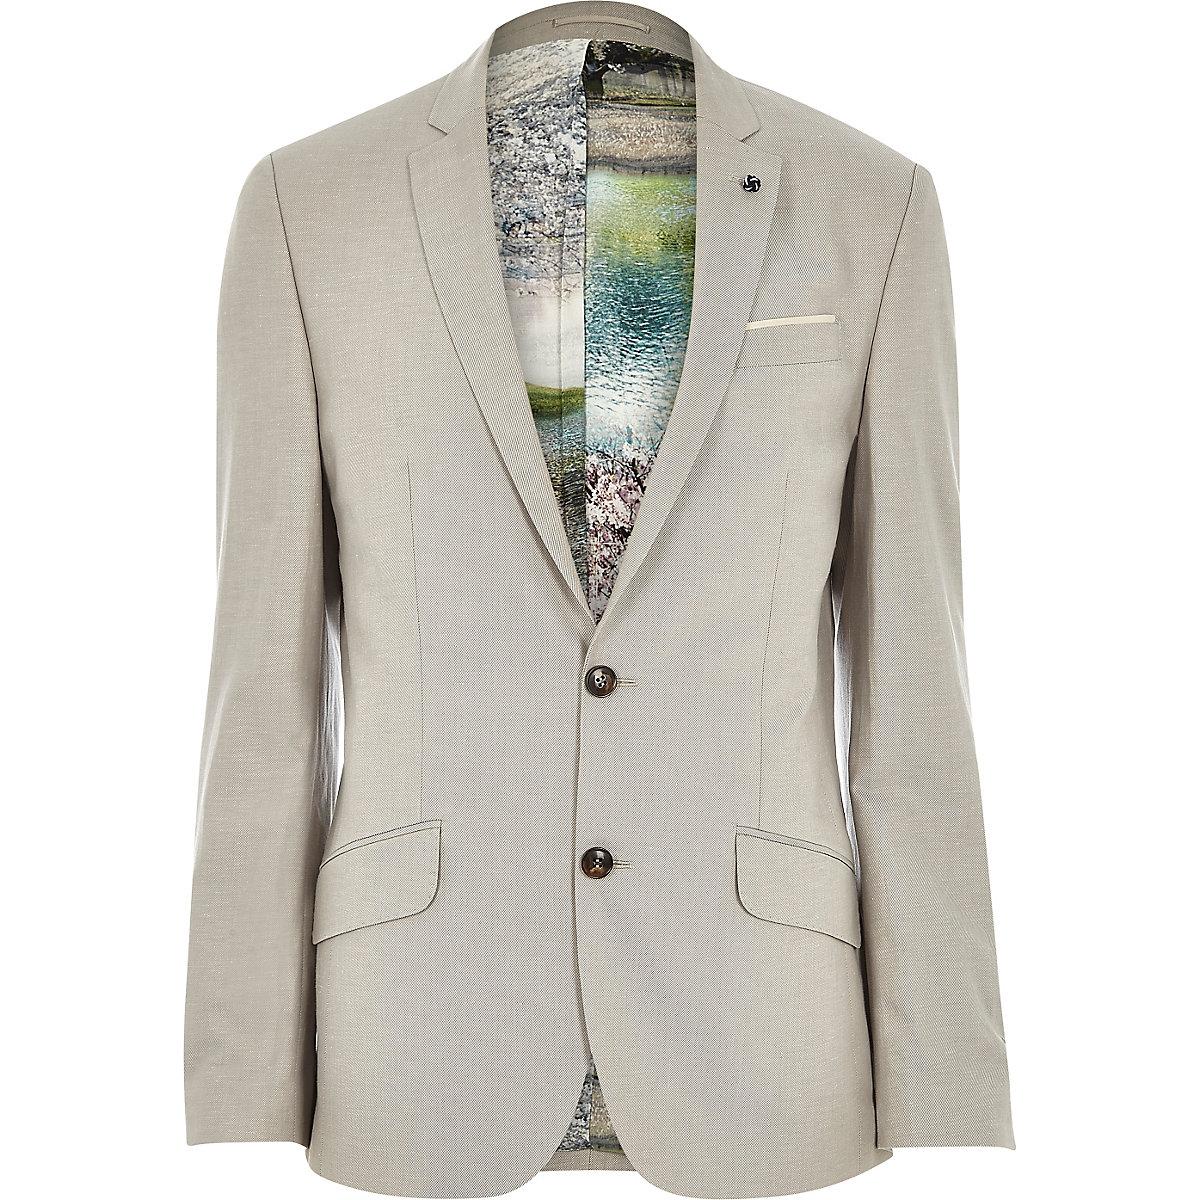 Beige linen-blend print slim suit jacket